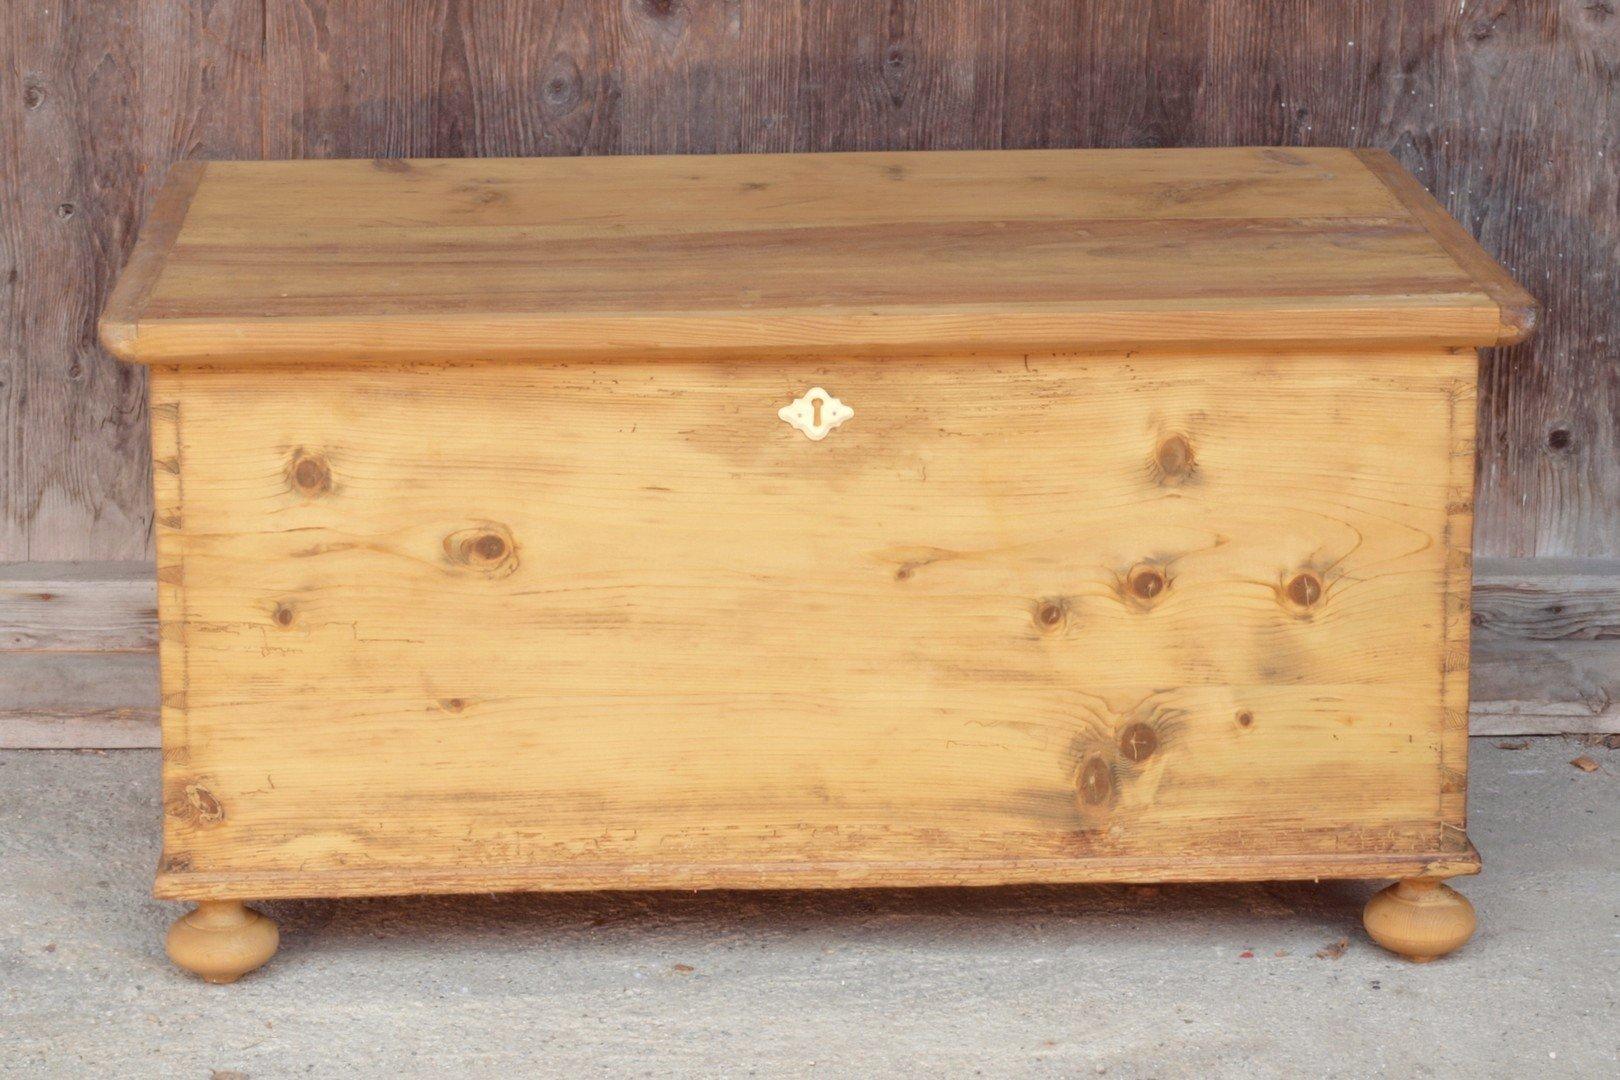 Alte Antike Truhe Holztruhe Kiste Holzkiste Bauernmöbel Antike